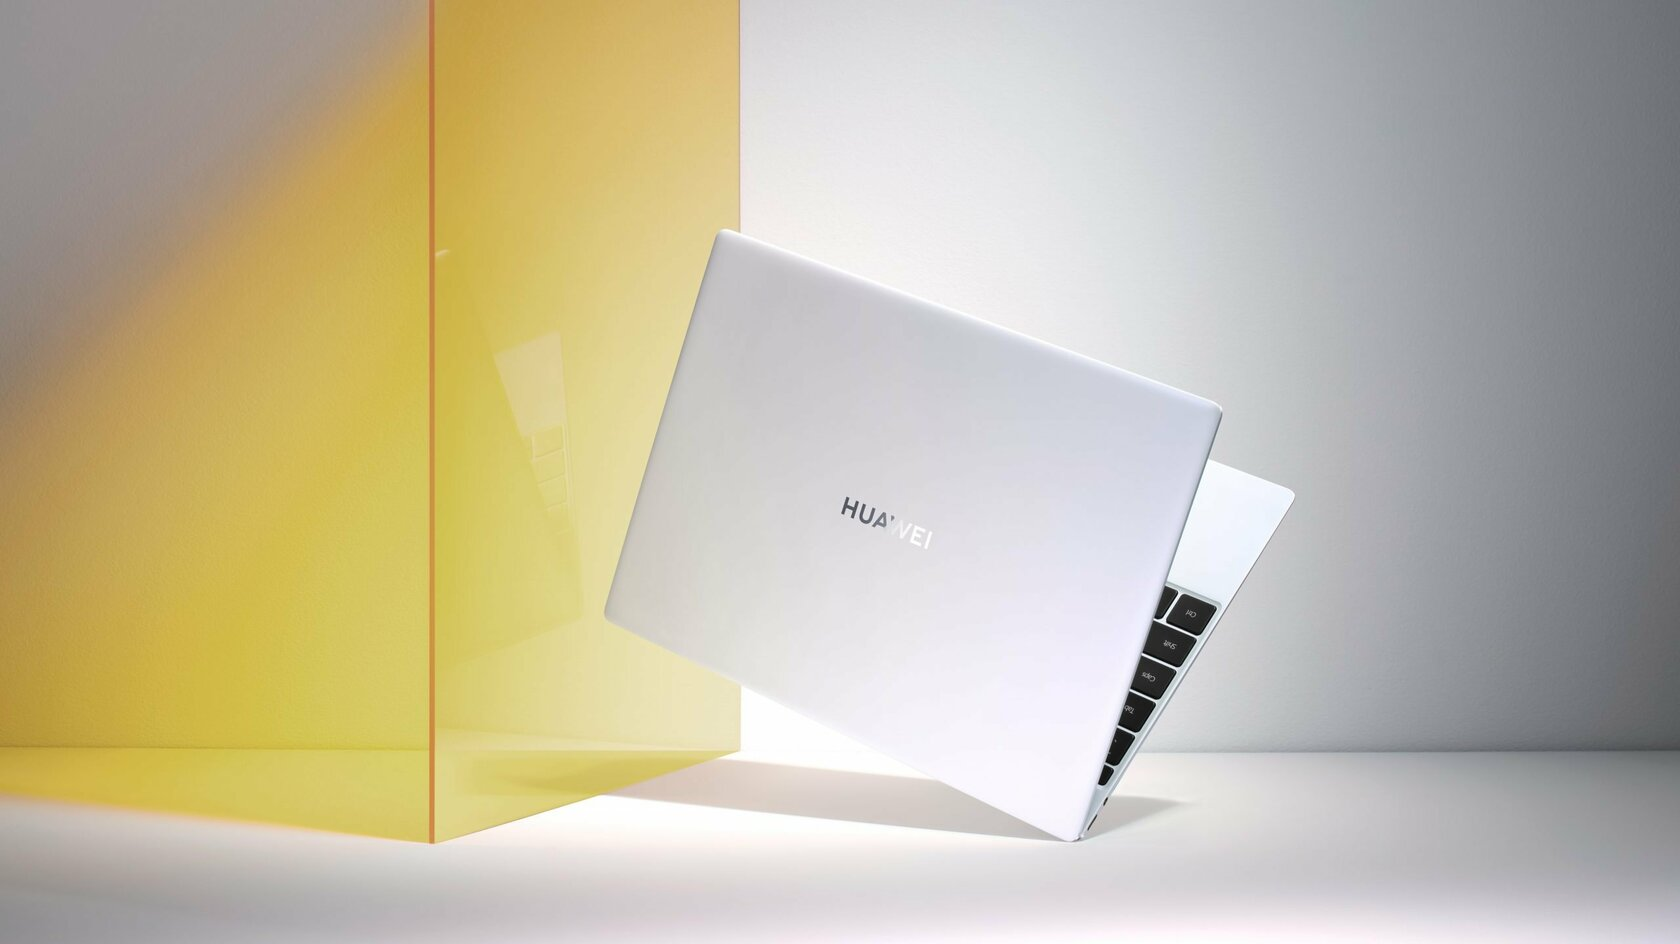 Huawei привезла новинки в Россию: MateBook X, FreeBuds Pro и Watch GT 2 Pro - Wylsa.com